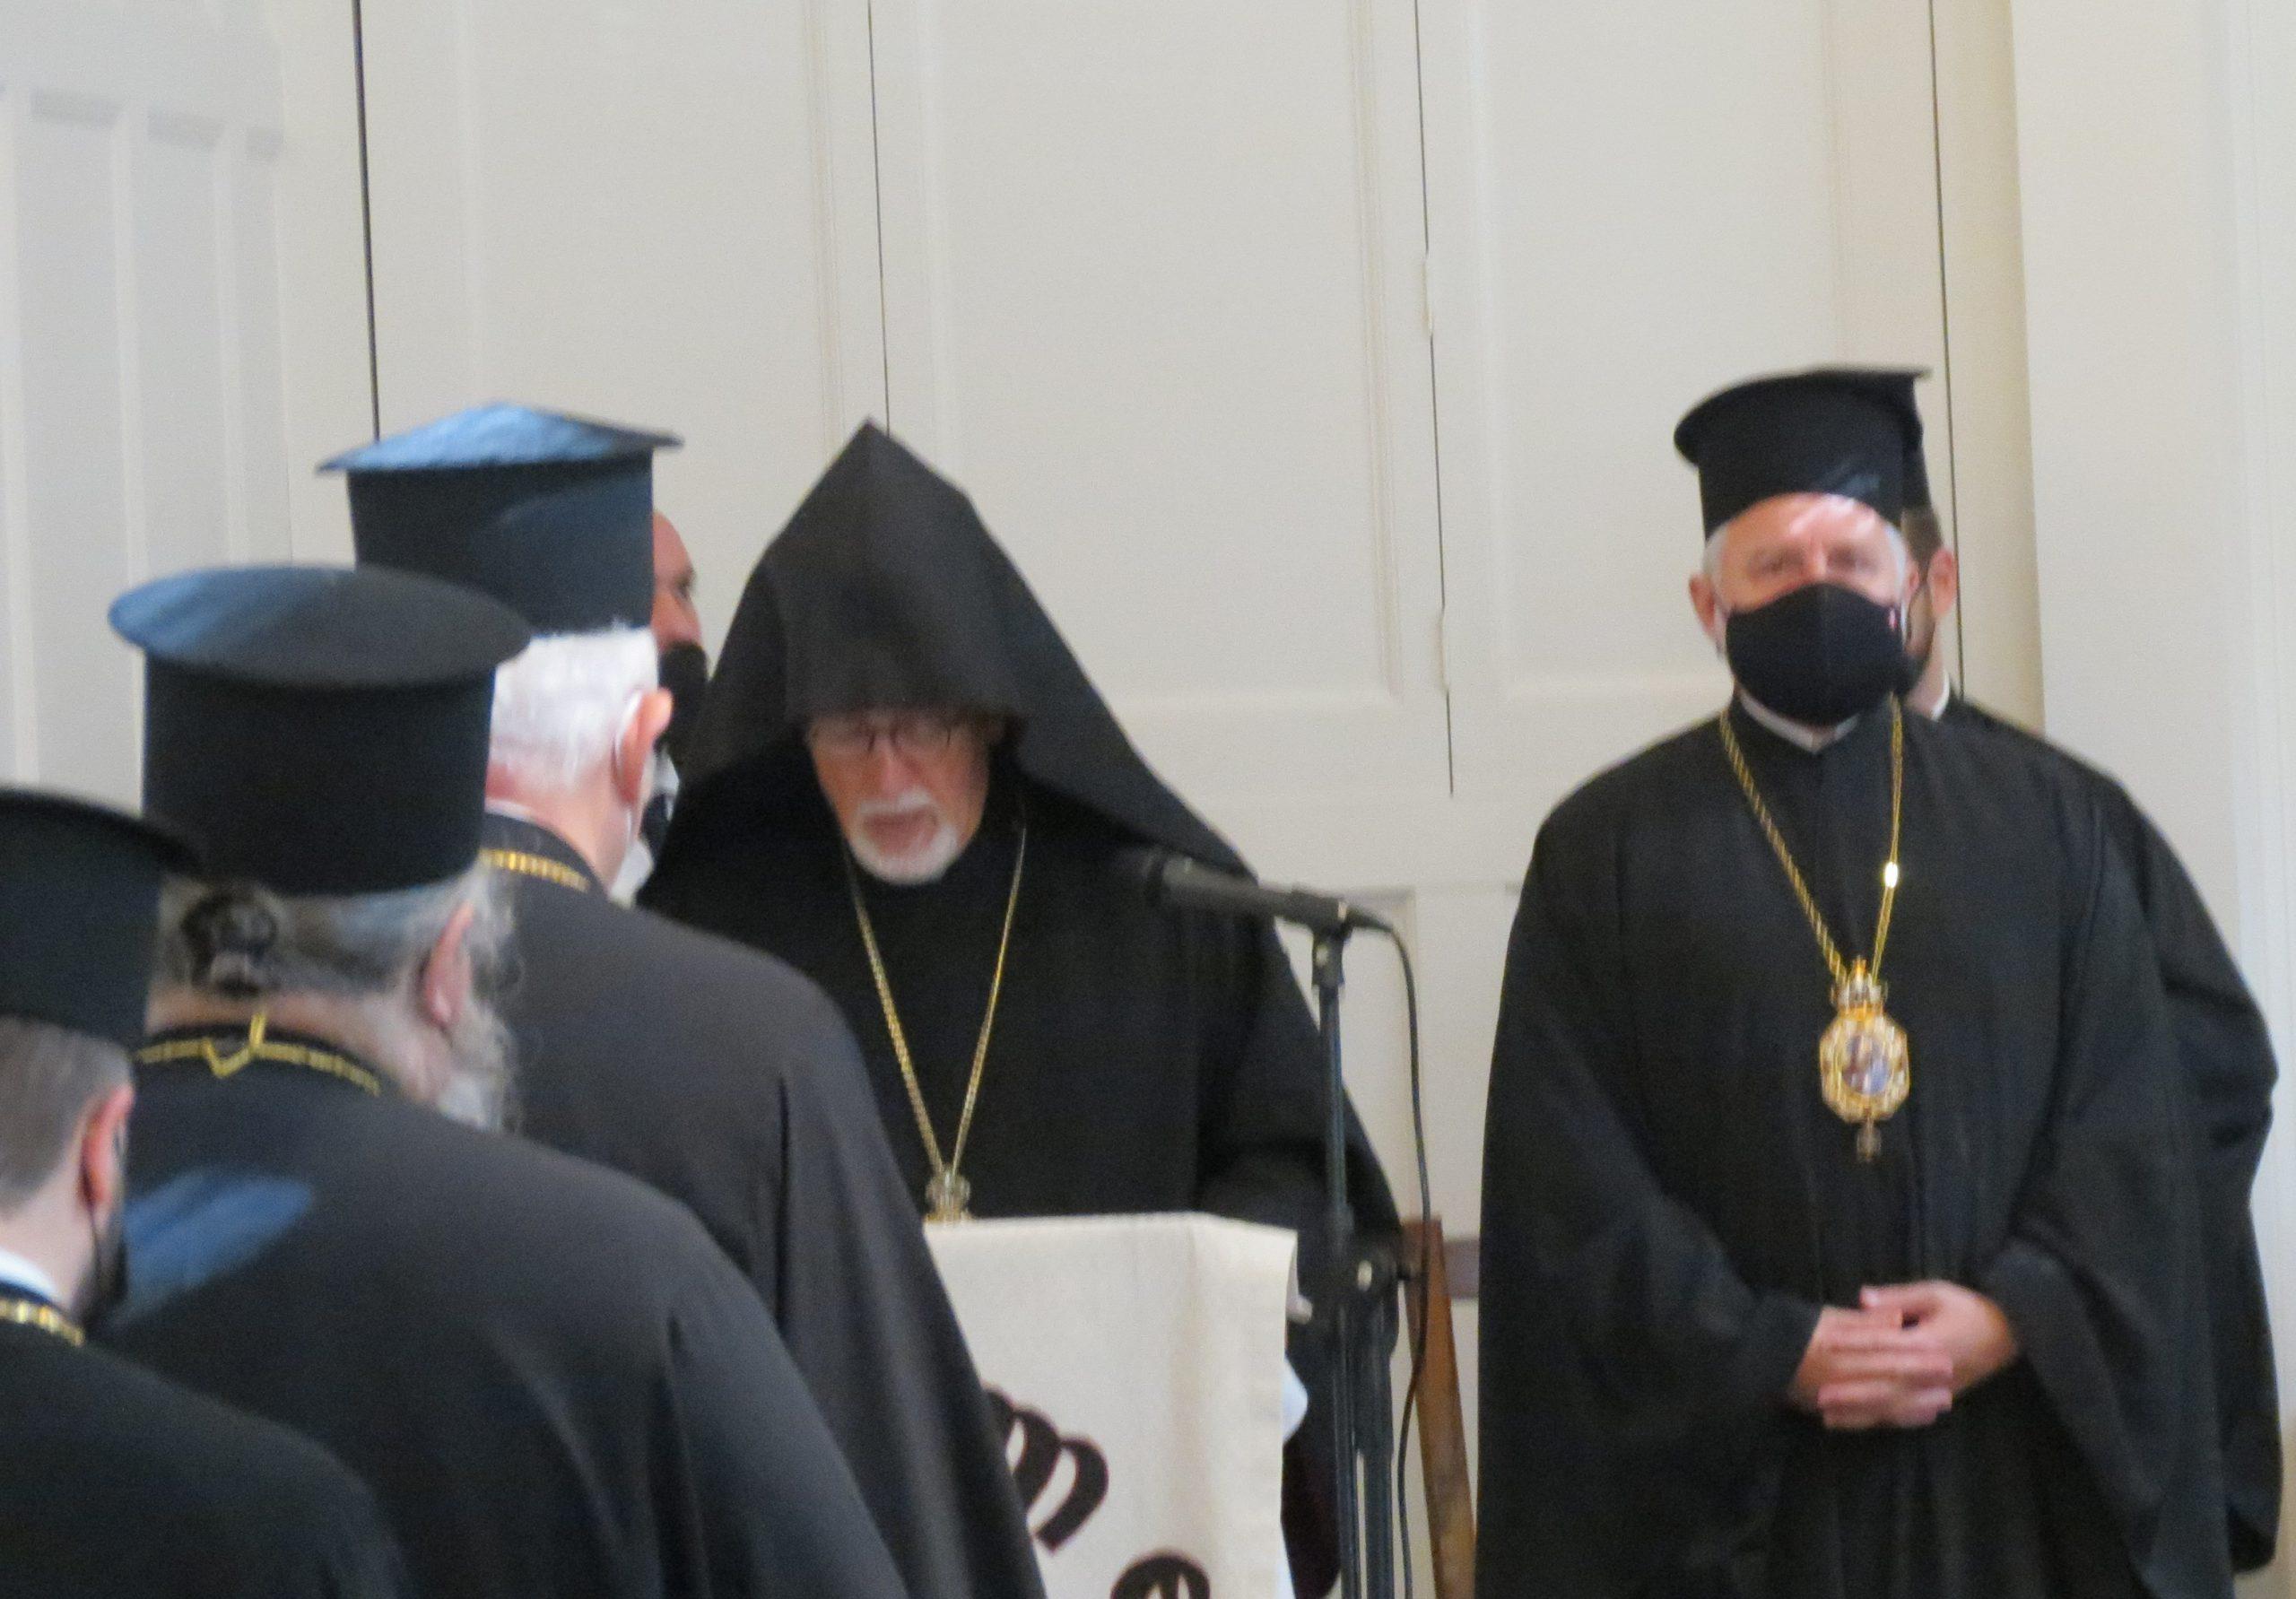 Closing Prayer by Archbishop Vicken Aykazian